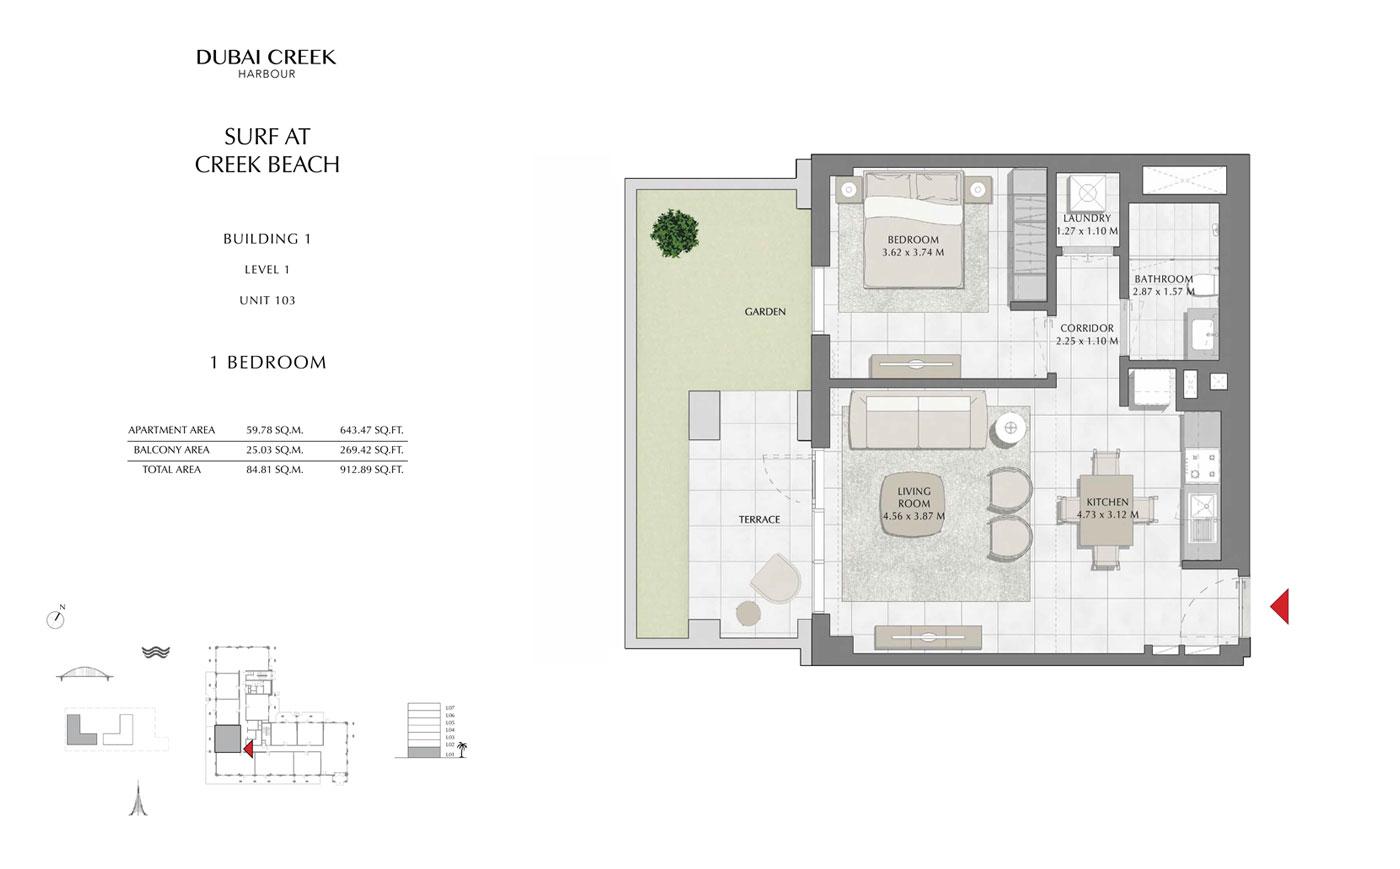 Building-1-1-Bedroom,-Level-1,-Unit-103,-Size-912.89-sq-ft